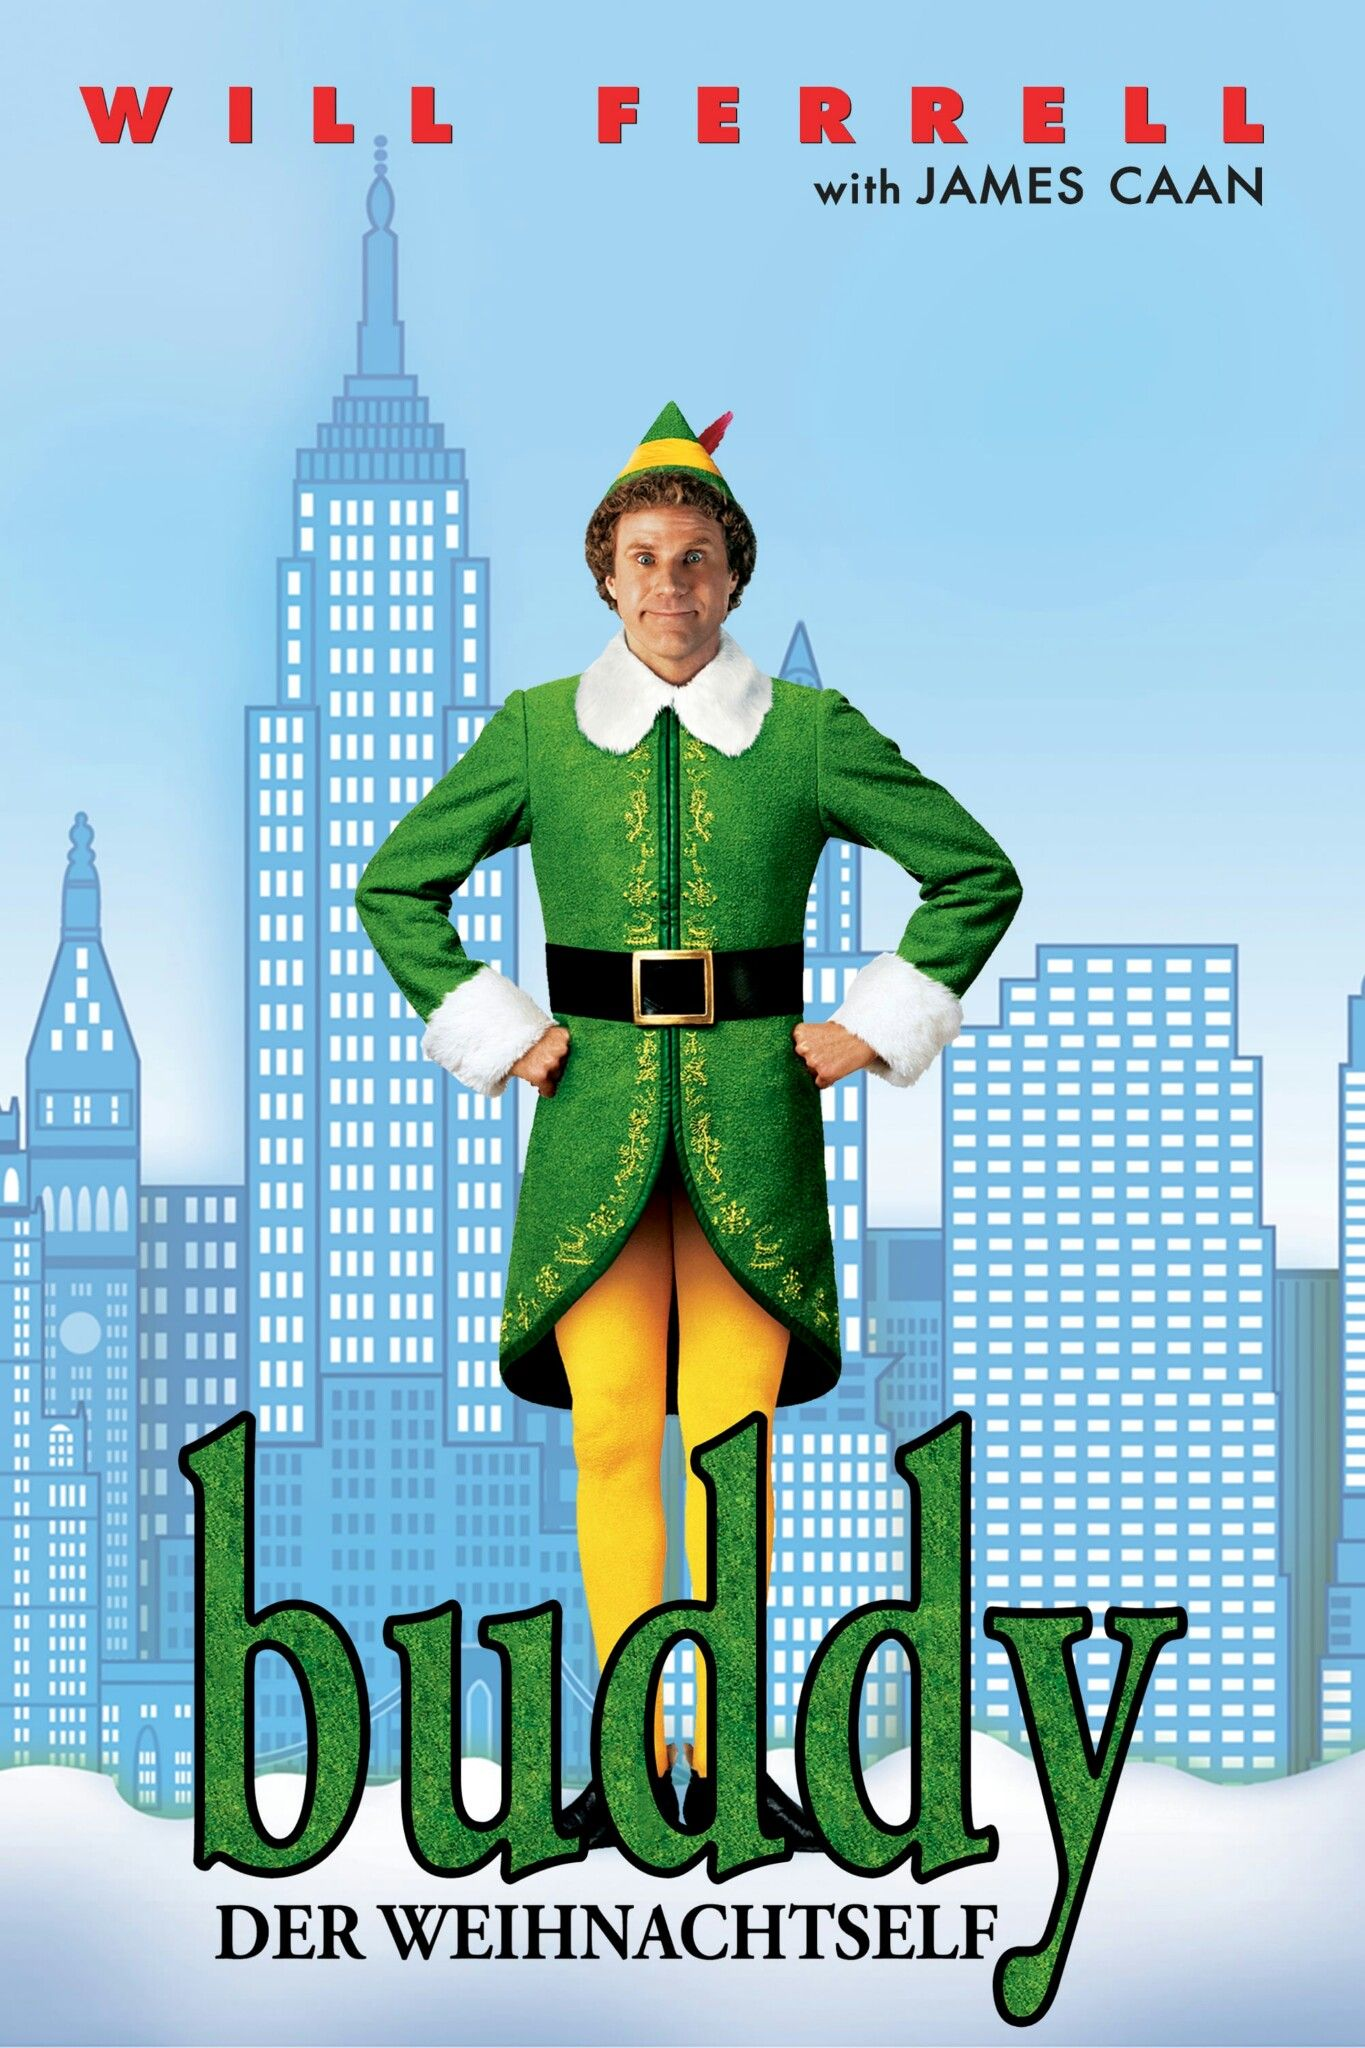 Elf german movie poster christmas movie posters artwork